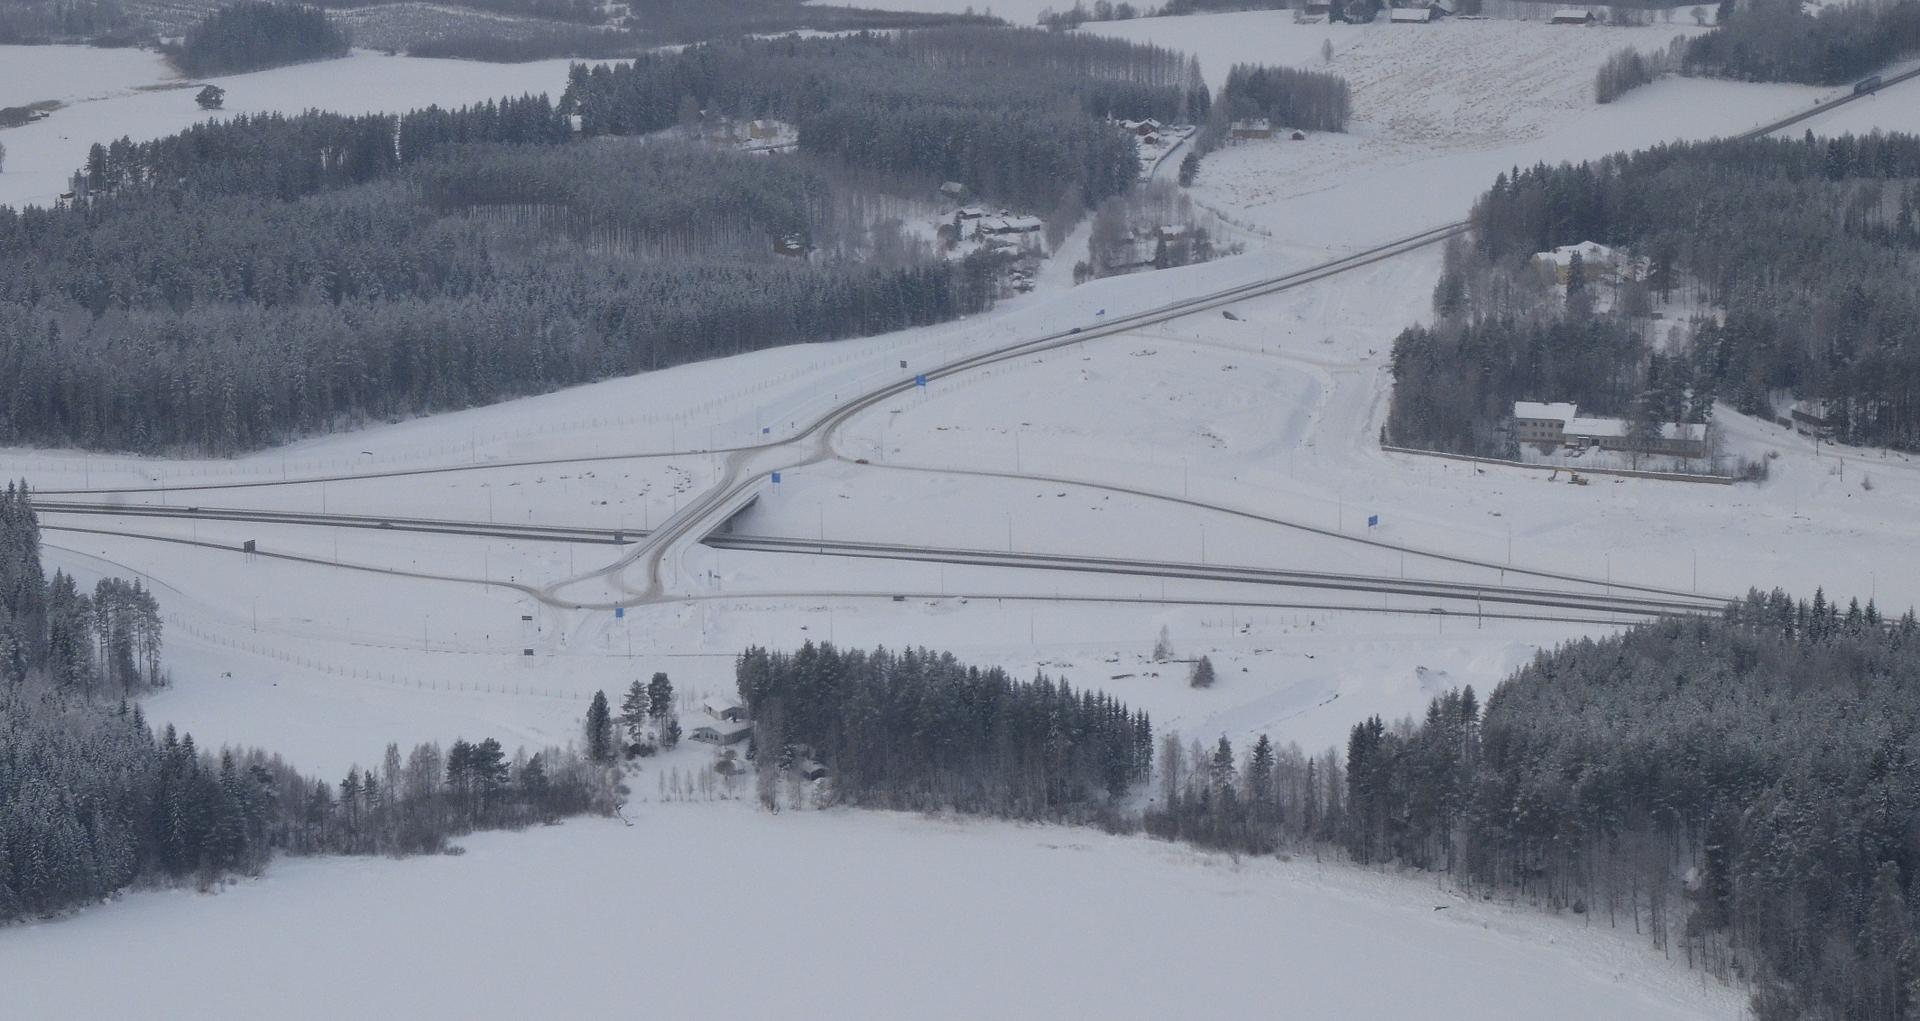 Lumi paljastaa uusia ajolinjoja:)